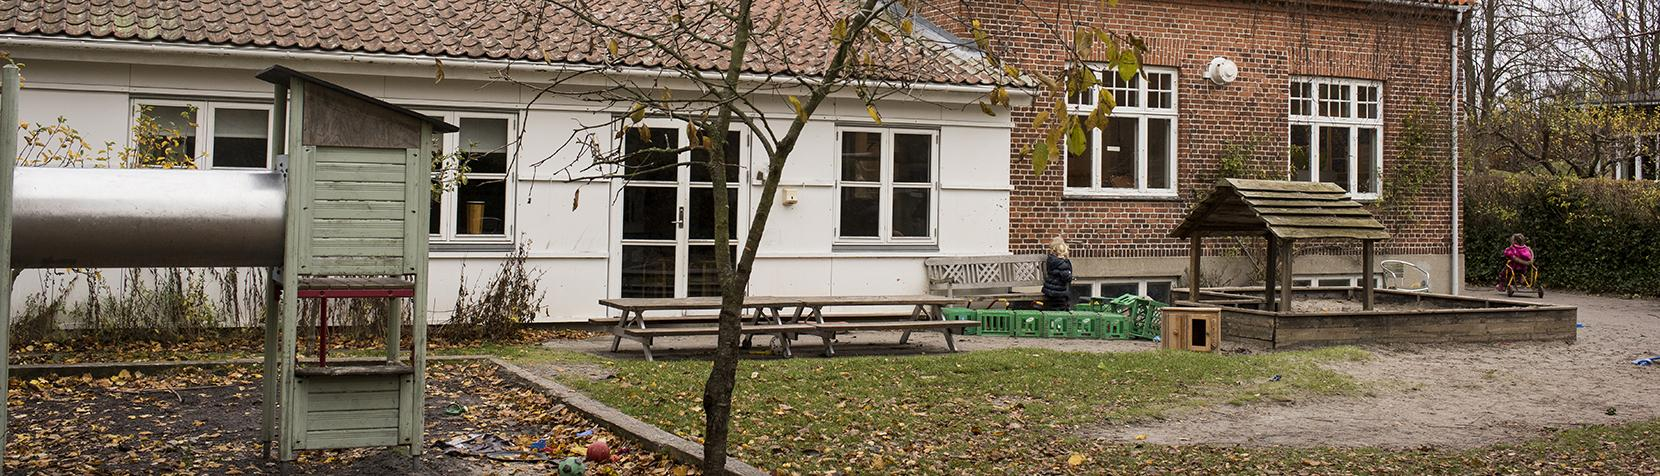 Børnehuset Gøngehuset